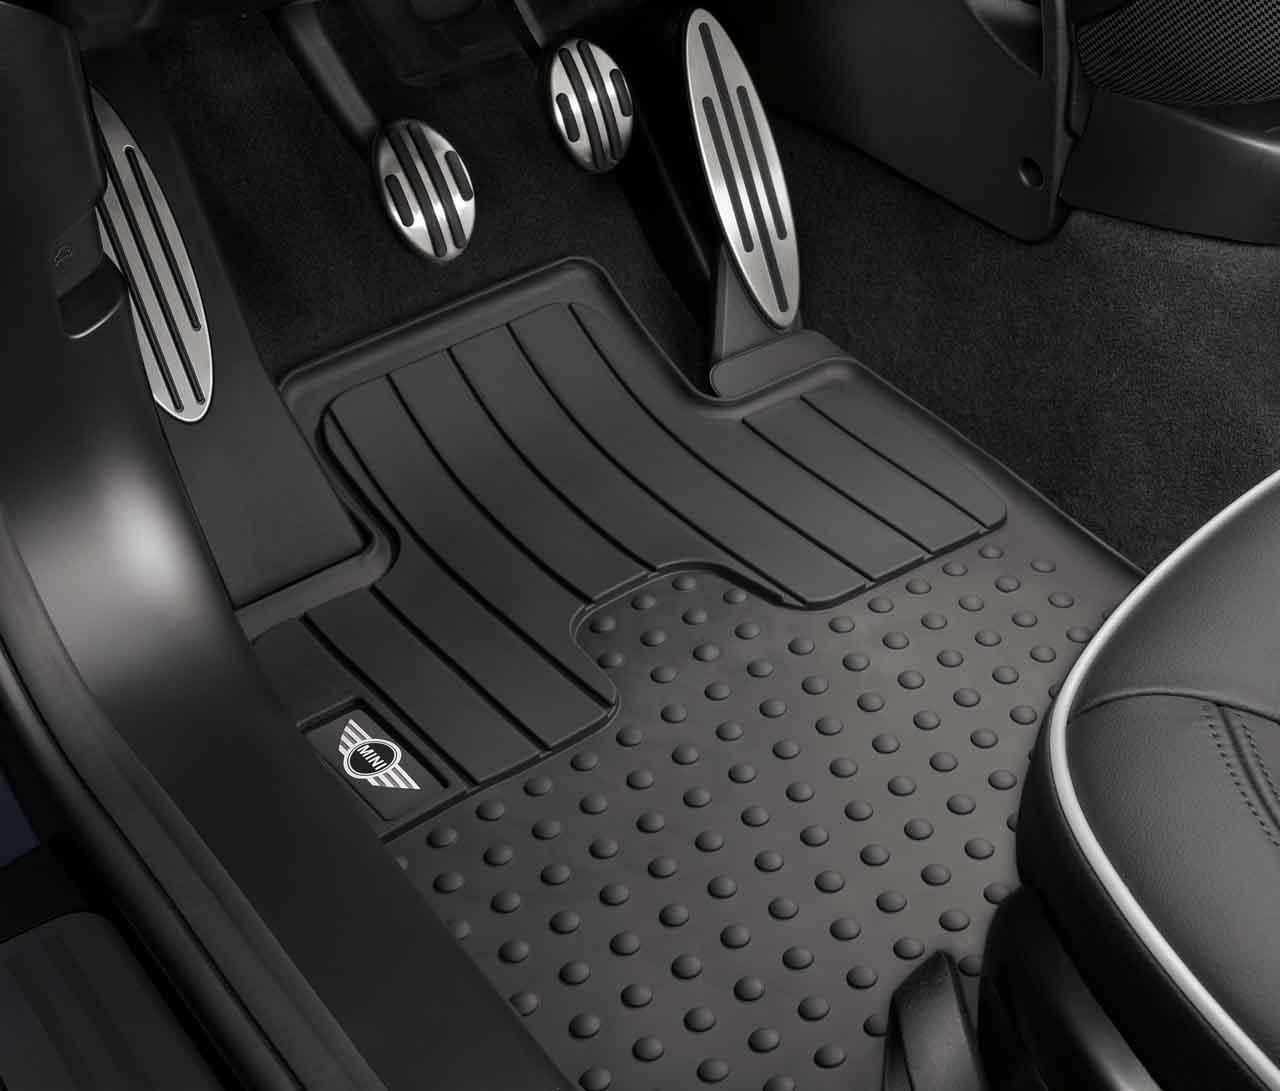 Mini cooper rubber floor mats uk - Mini Genuine All Weather Floor Mats Set Front For R60 R61 51472243921